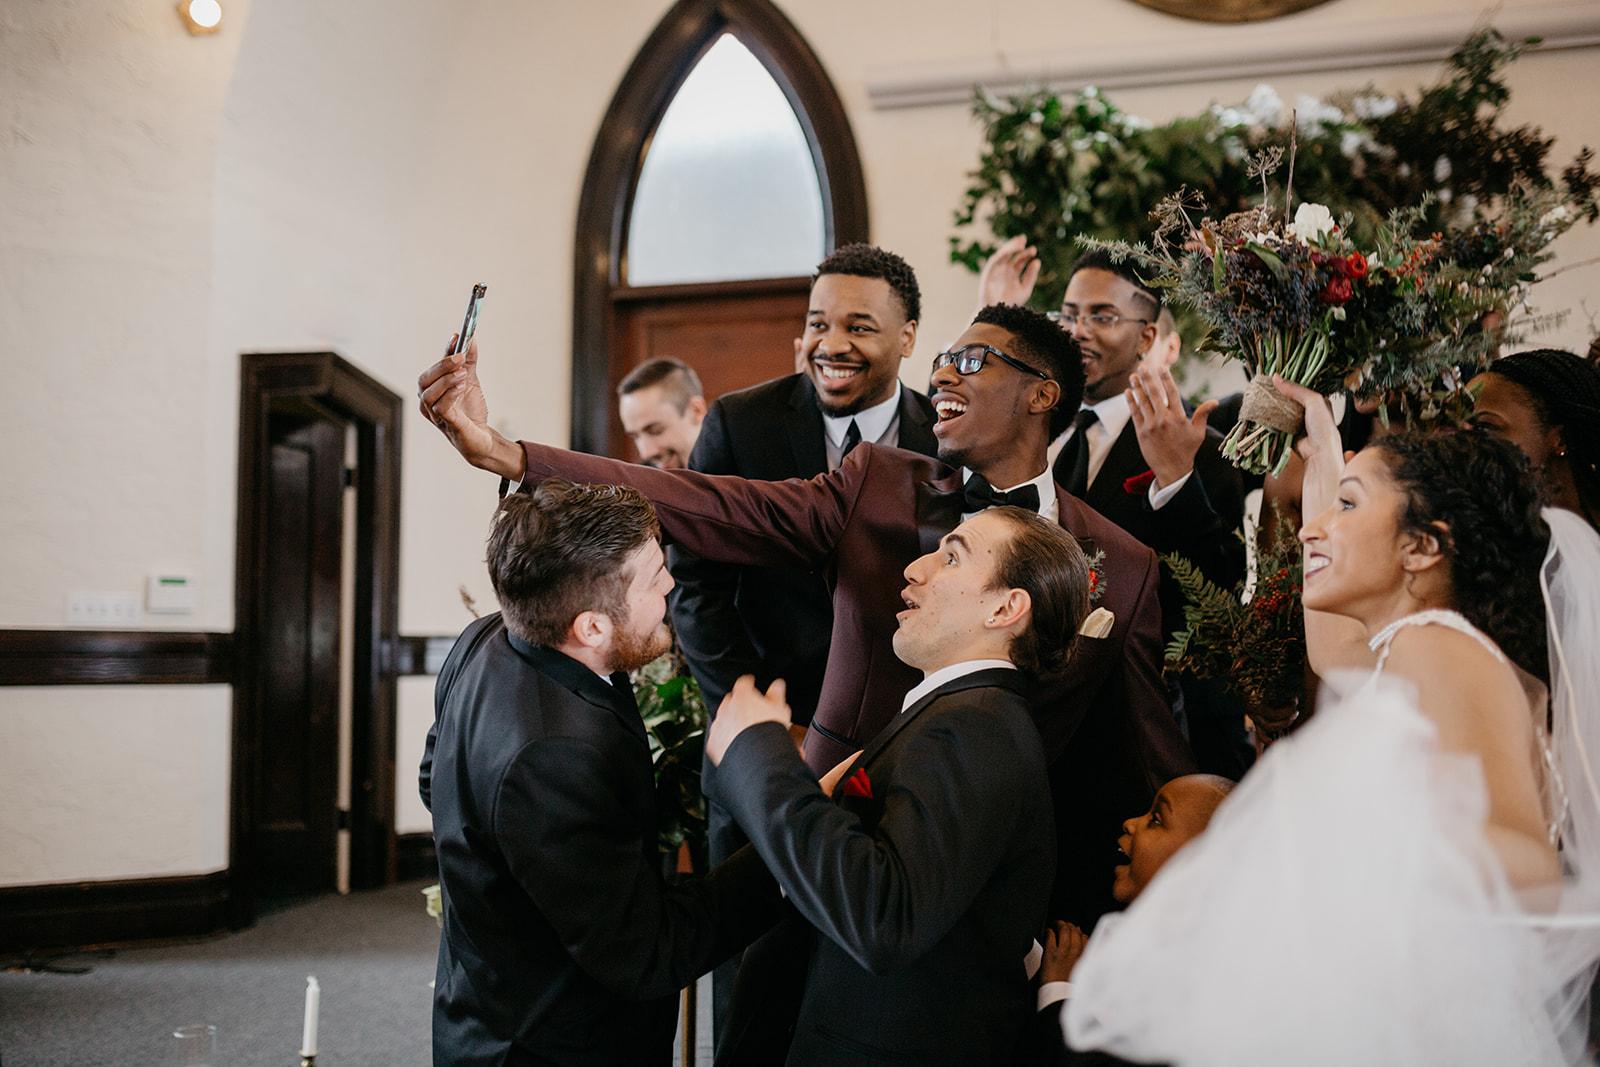 portland - wedding - photographer - doorofhopechurch356.jpg